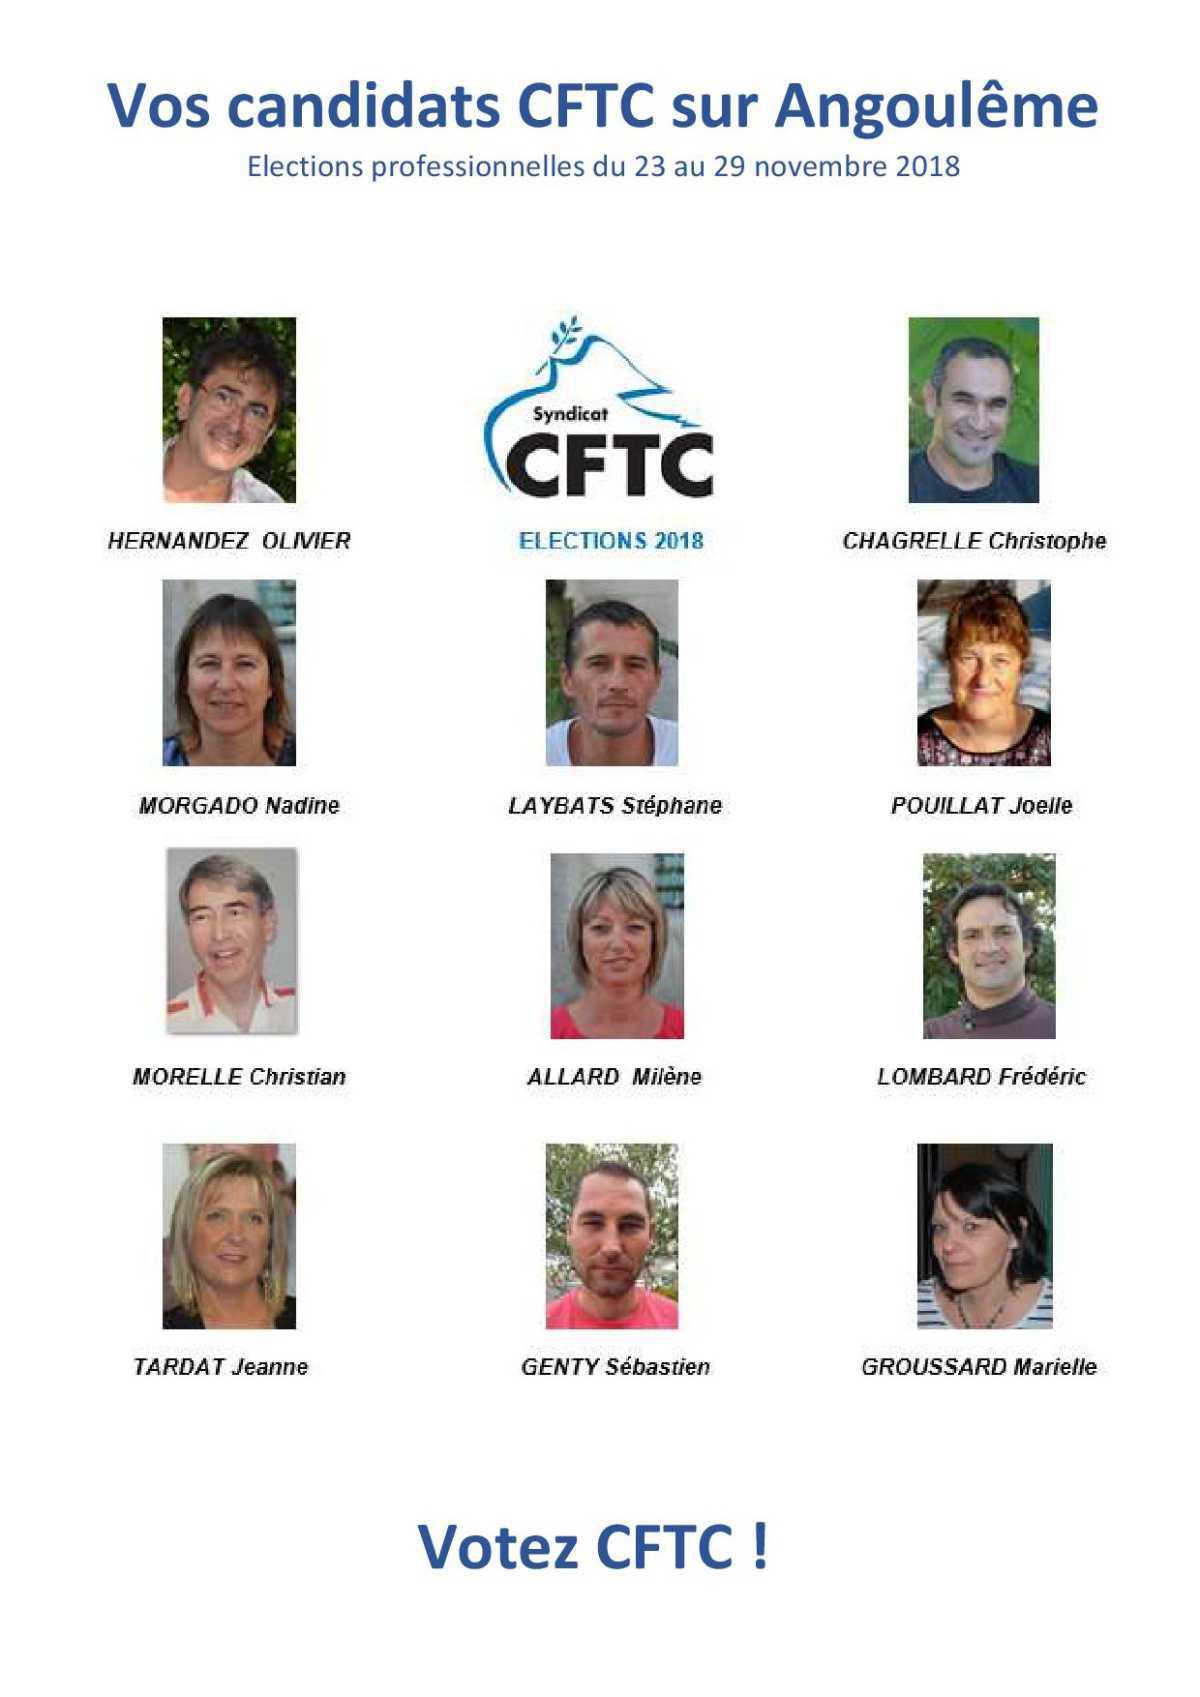 Vos candidats CFTC sur Angoulême. OCT 2018